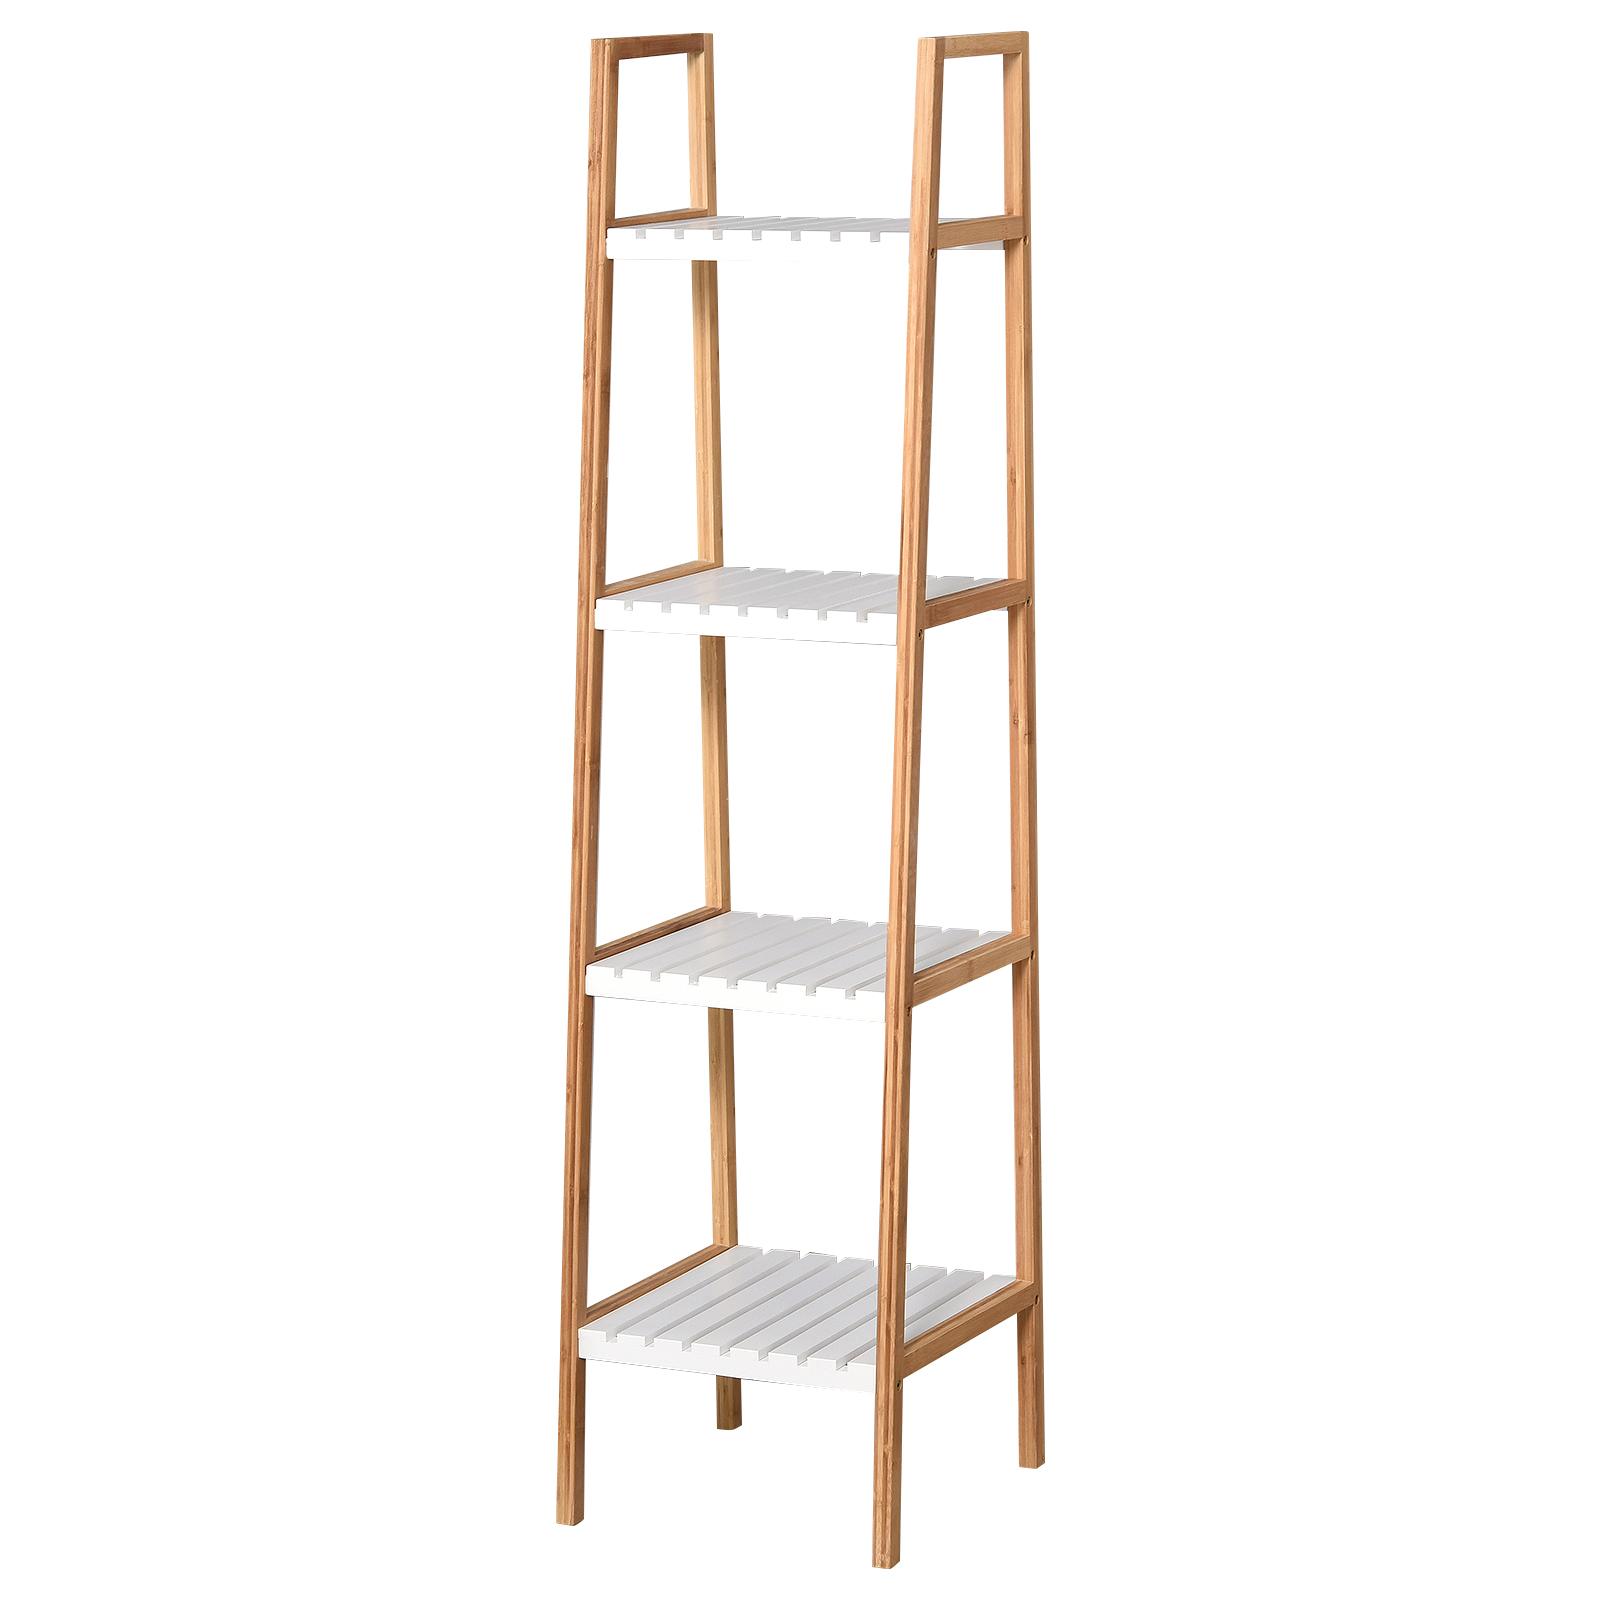 Etagère salle de bain bambou 4 niveaux bois pin blanc